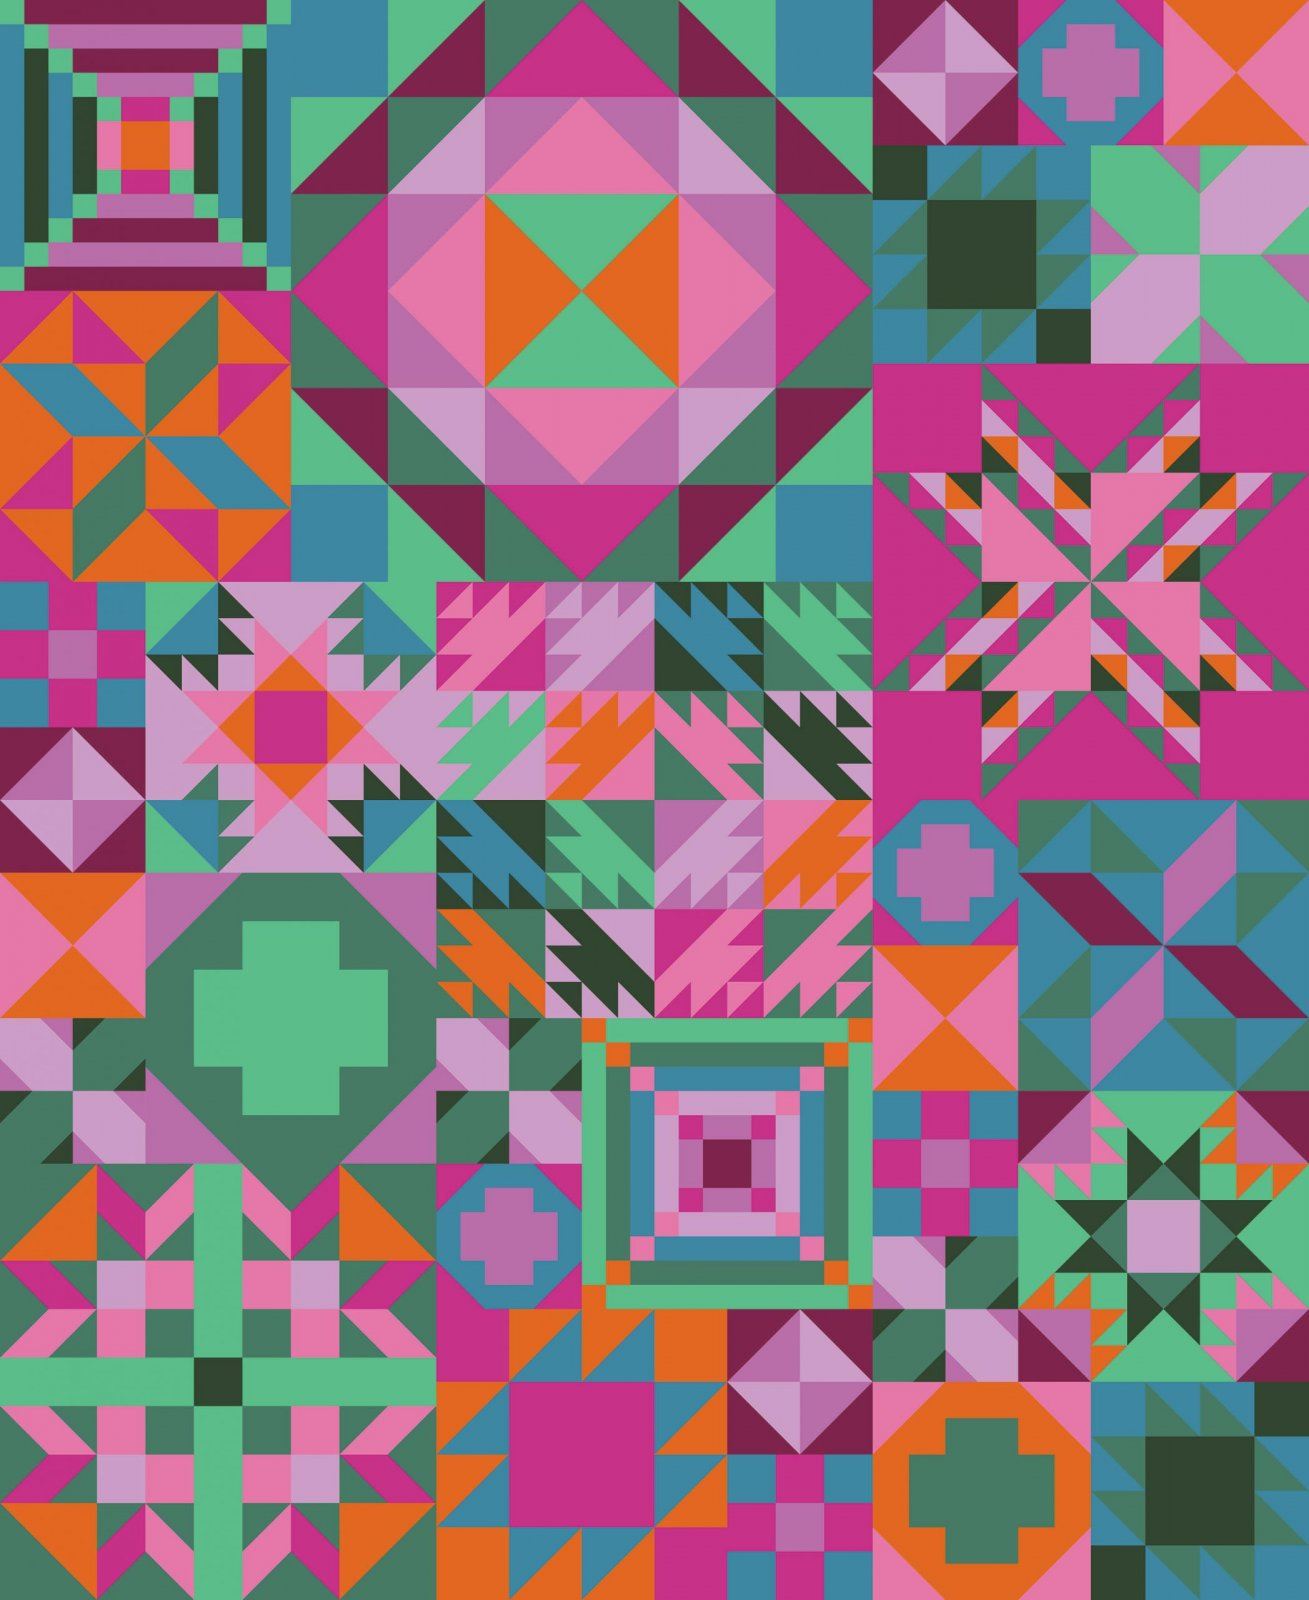 Tropical Getaway Colorway - My Favorite Color is Moda